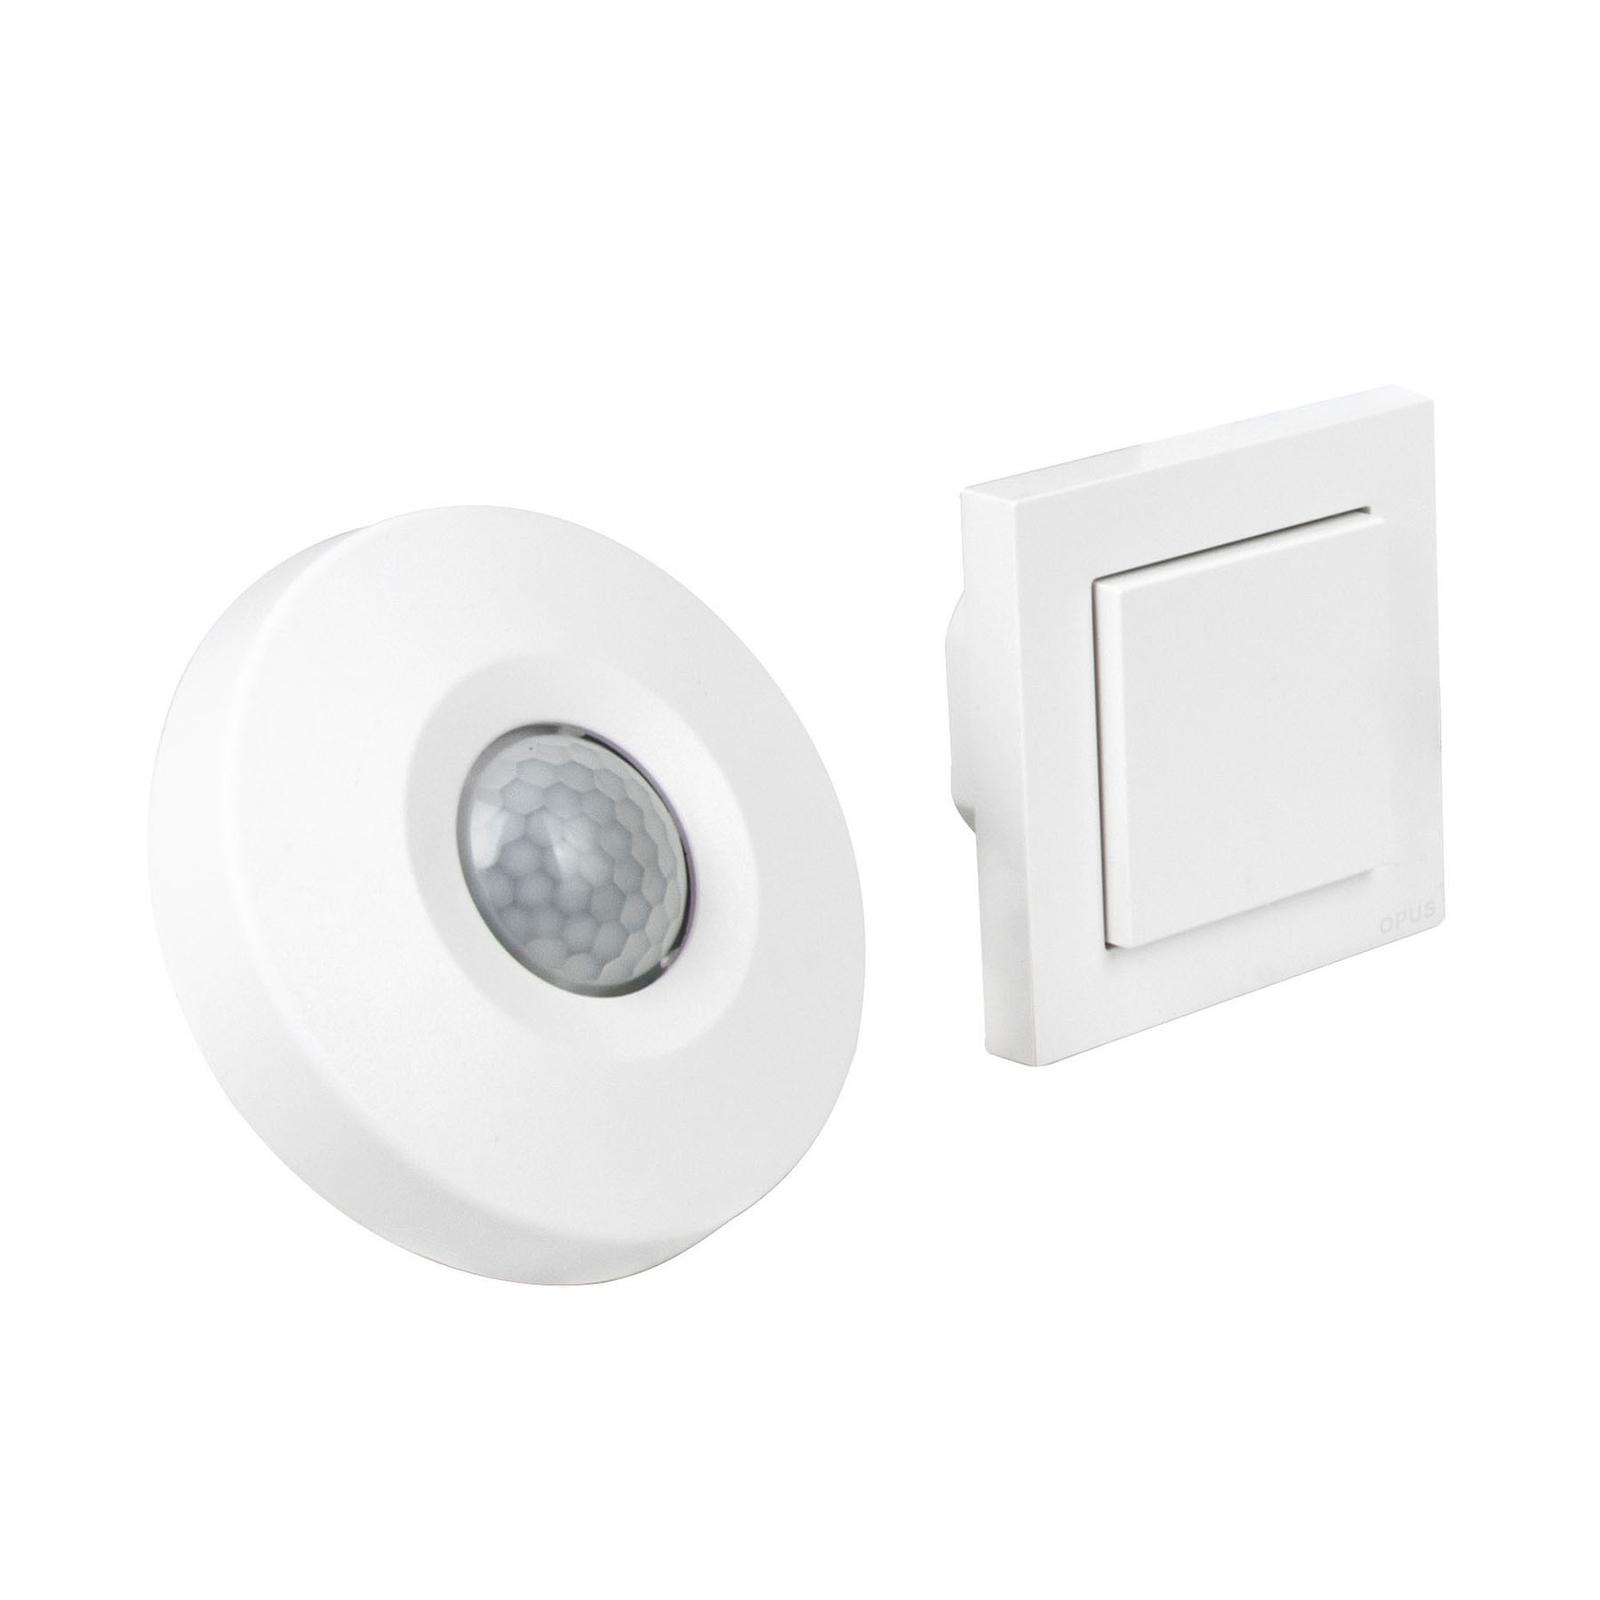 OPUS EasyStart Licht Sensor, Starter-Paket